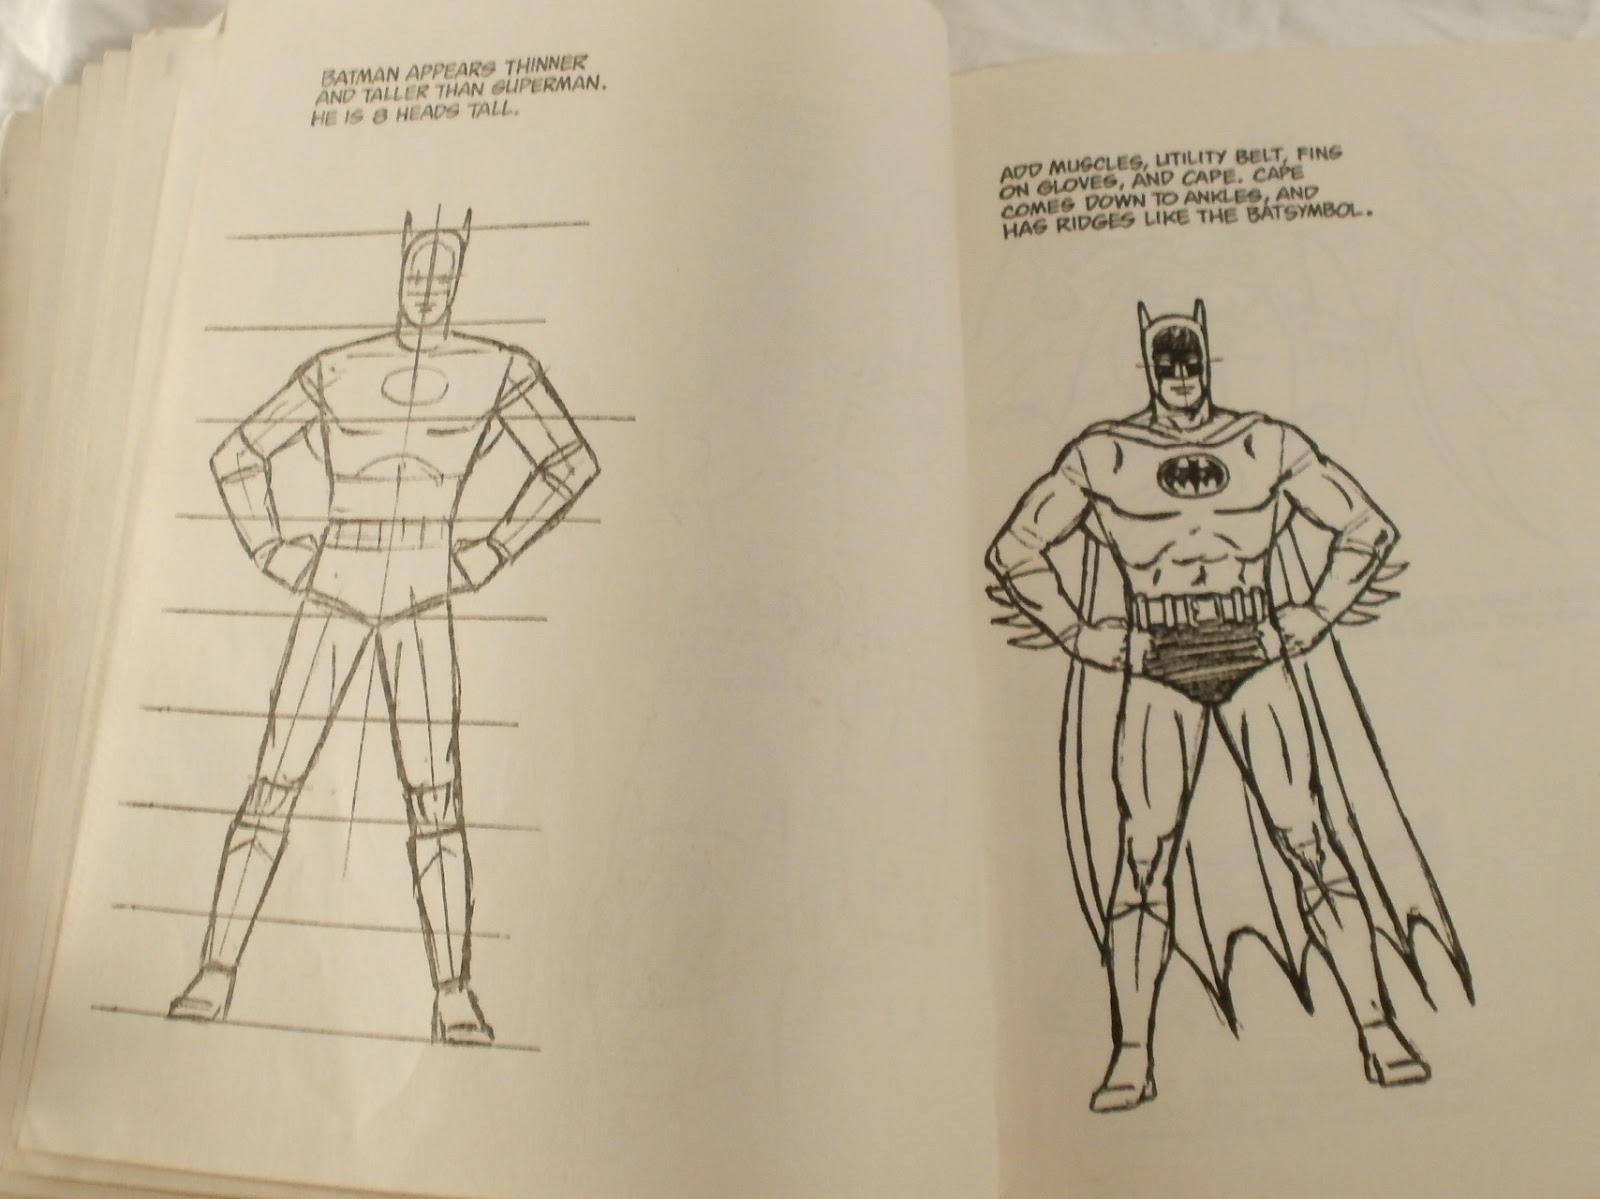 1983 quot how to draw super heroes quot golden book 2154 dc comics edition